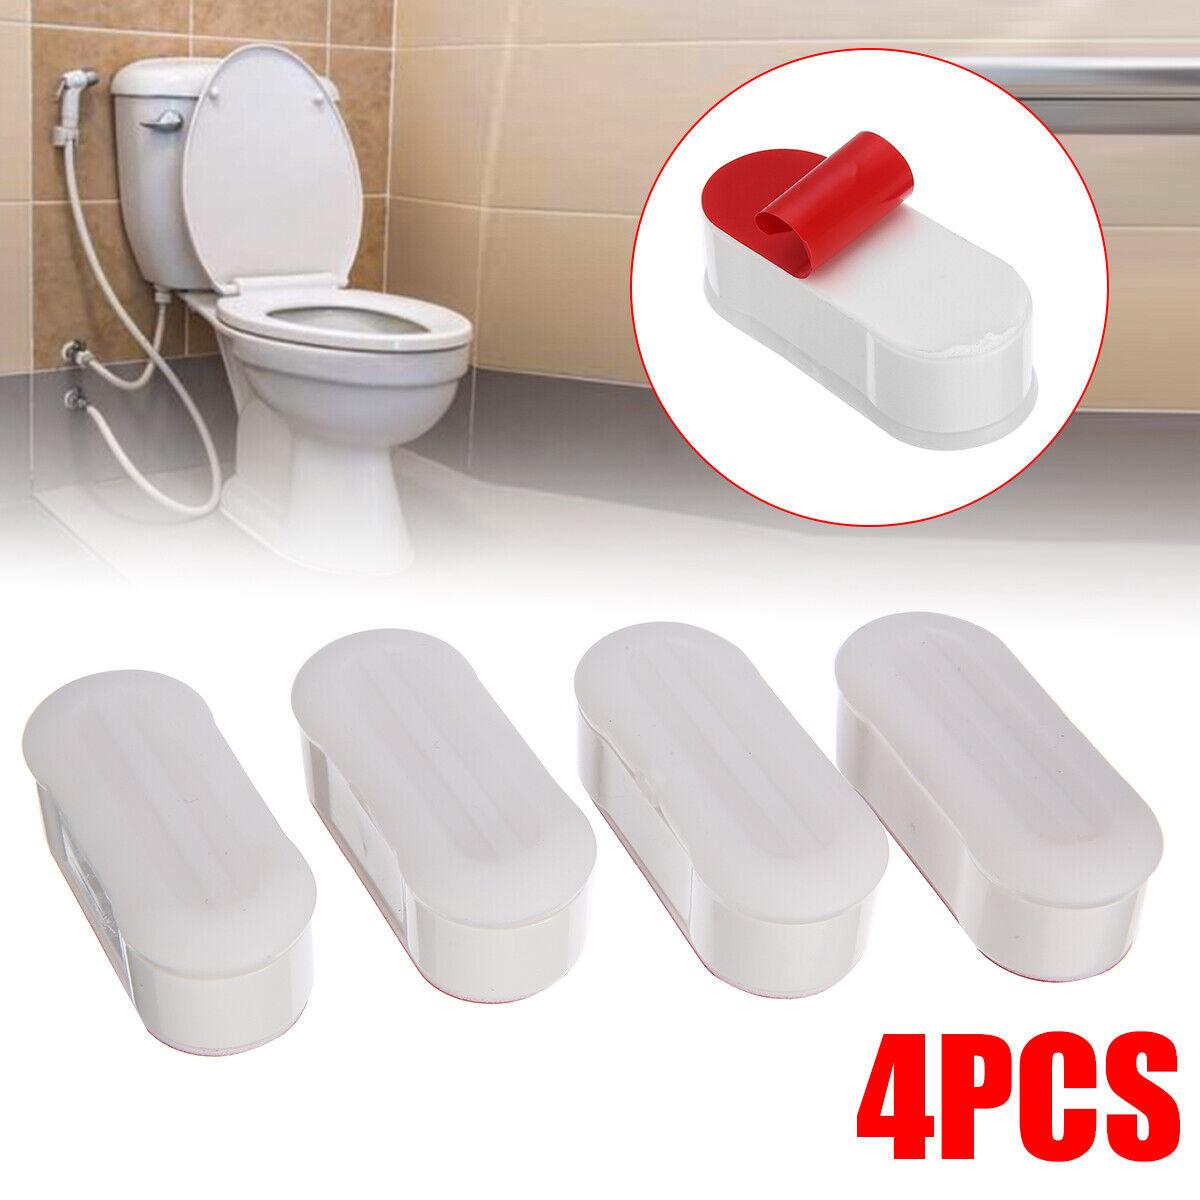 4pcs Toilet Seat Buffers Bumper Adhesive Strip Pad Universal For Bathroom /AU